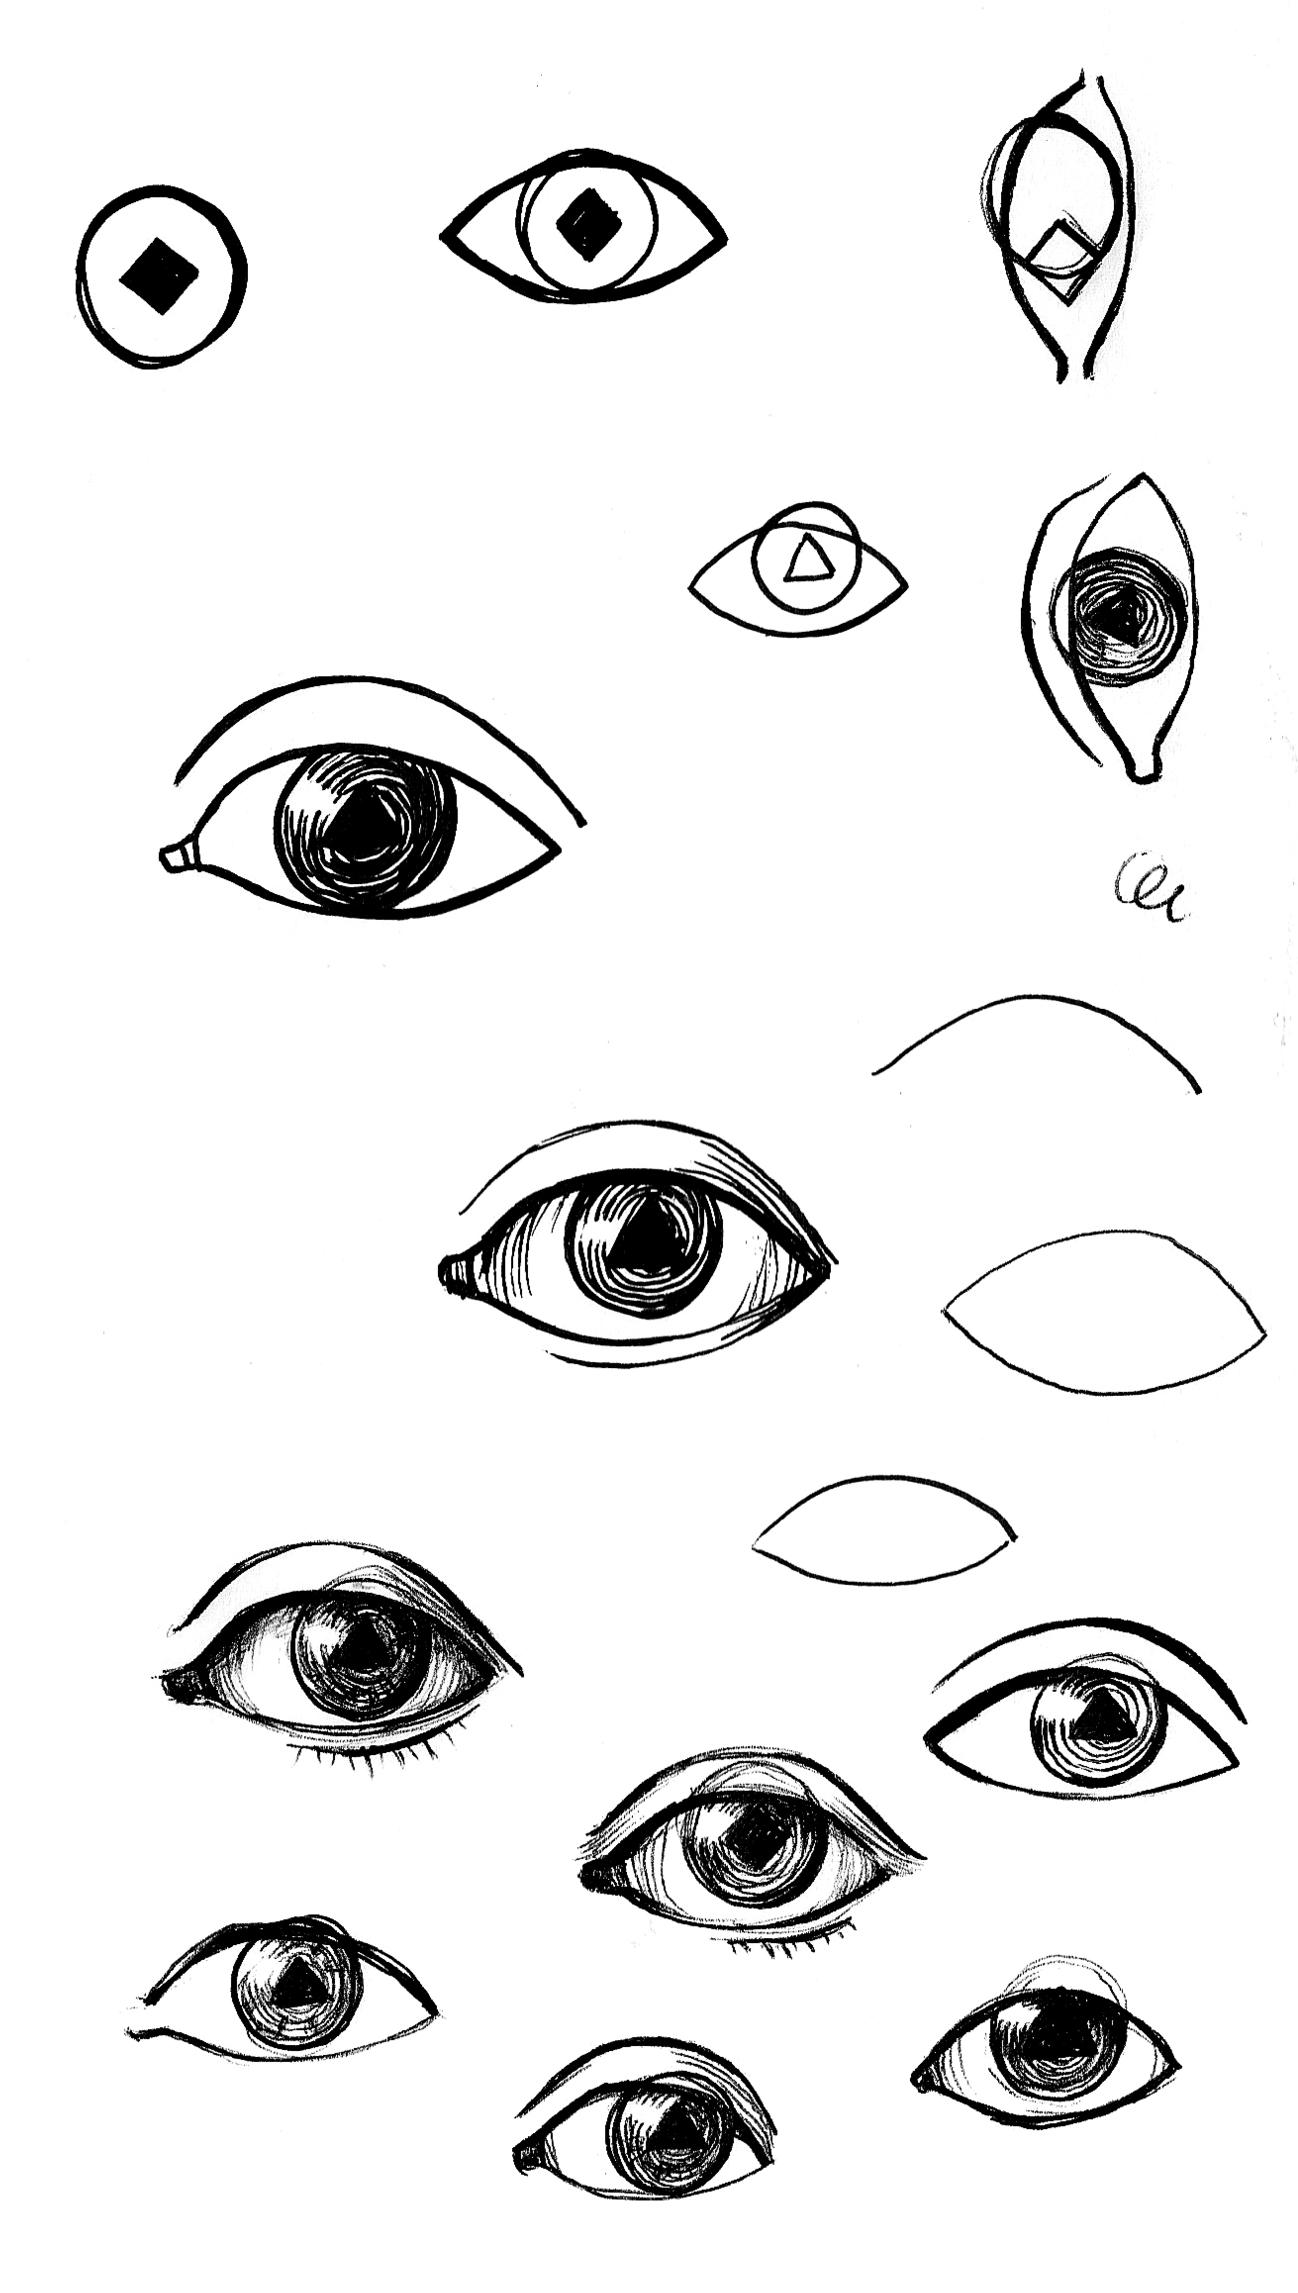 eyes_edit.jpg